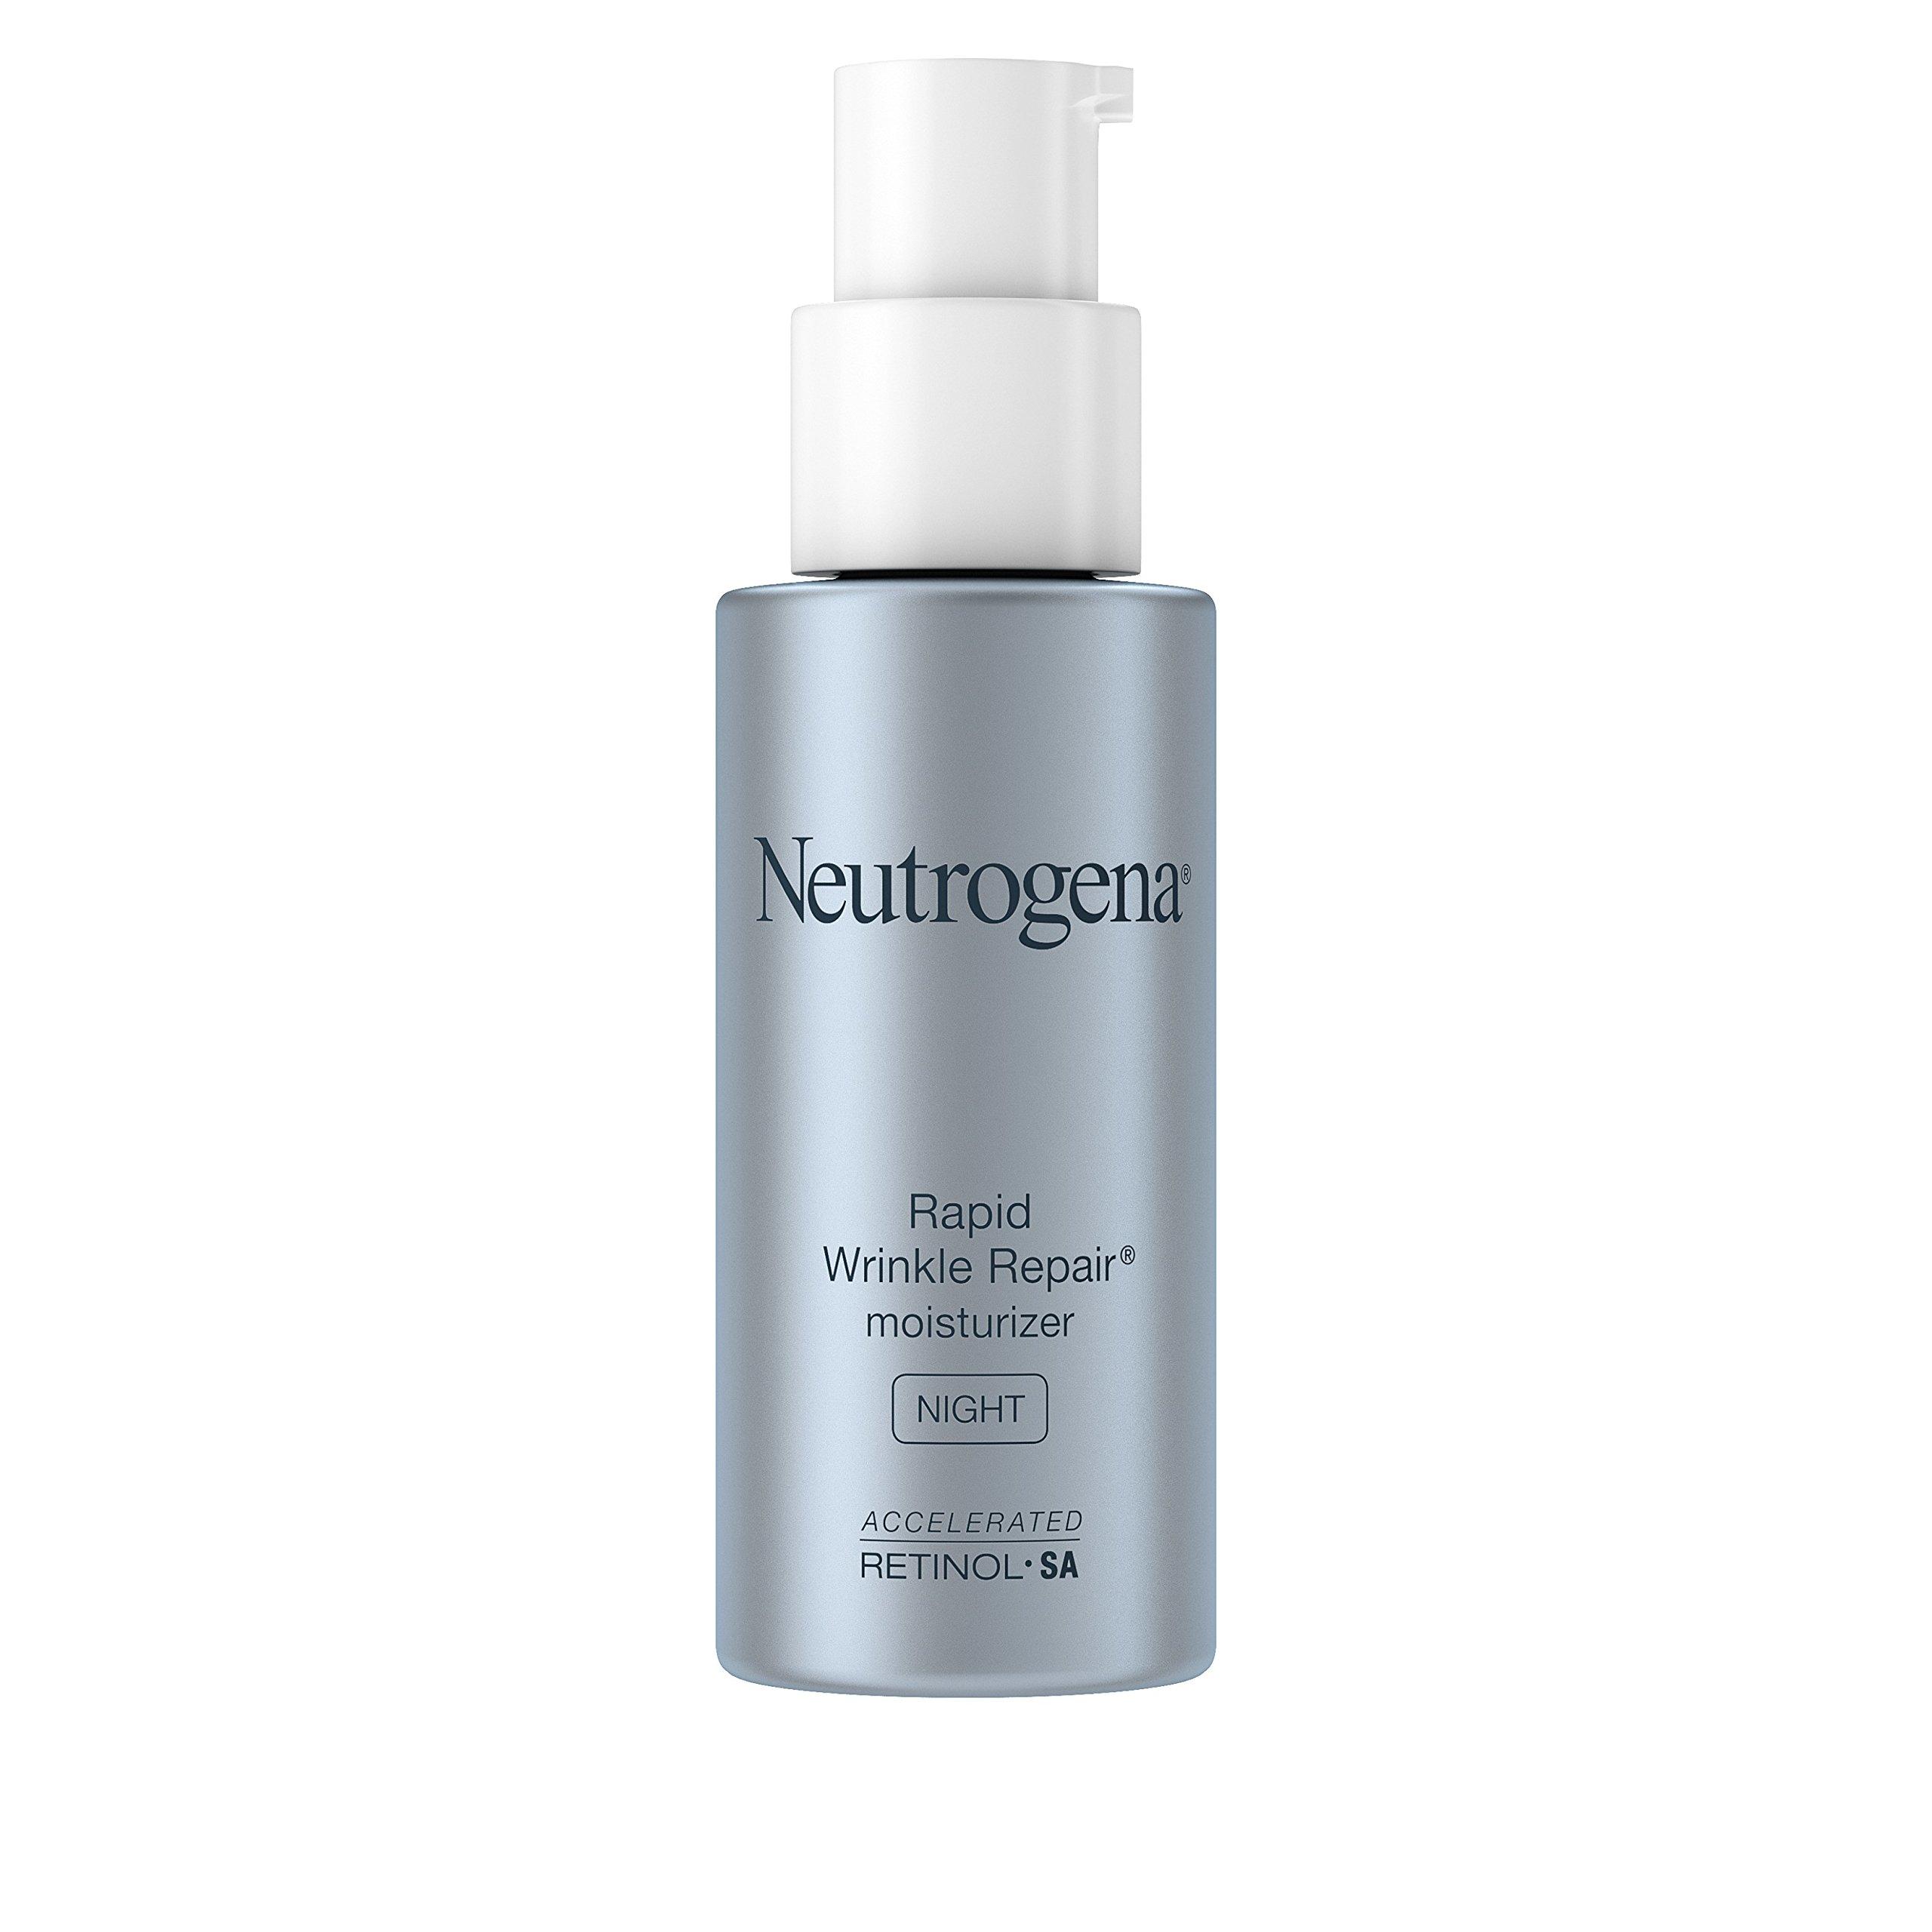 Neutrogena Wrinkle Anti Wrinkle Accelerated Moisturizer